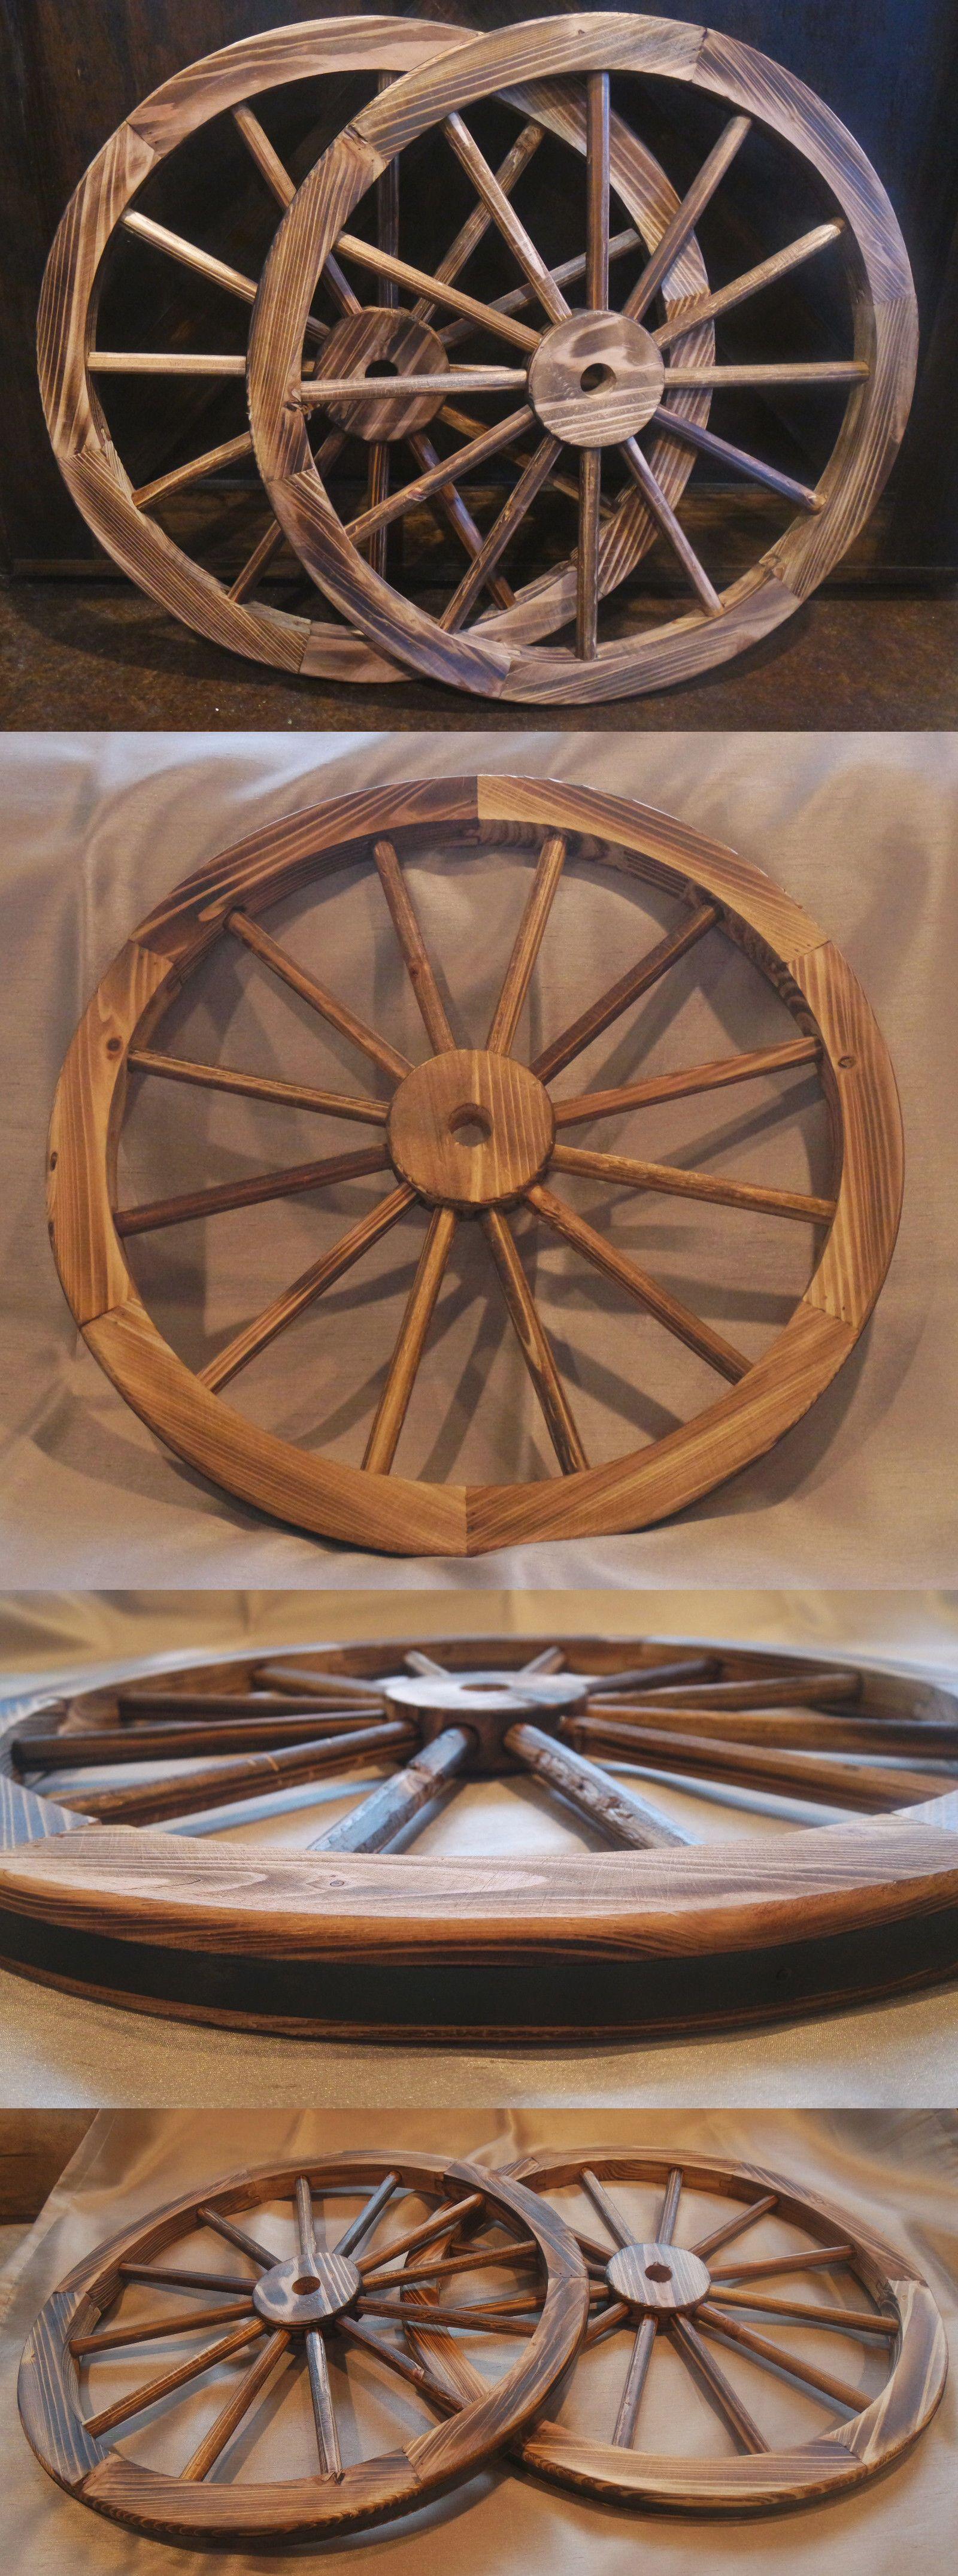 Other Garden D Cor 2034 2pk 24 Decorative Wooden Wagon Wheels Real